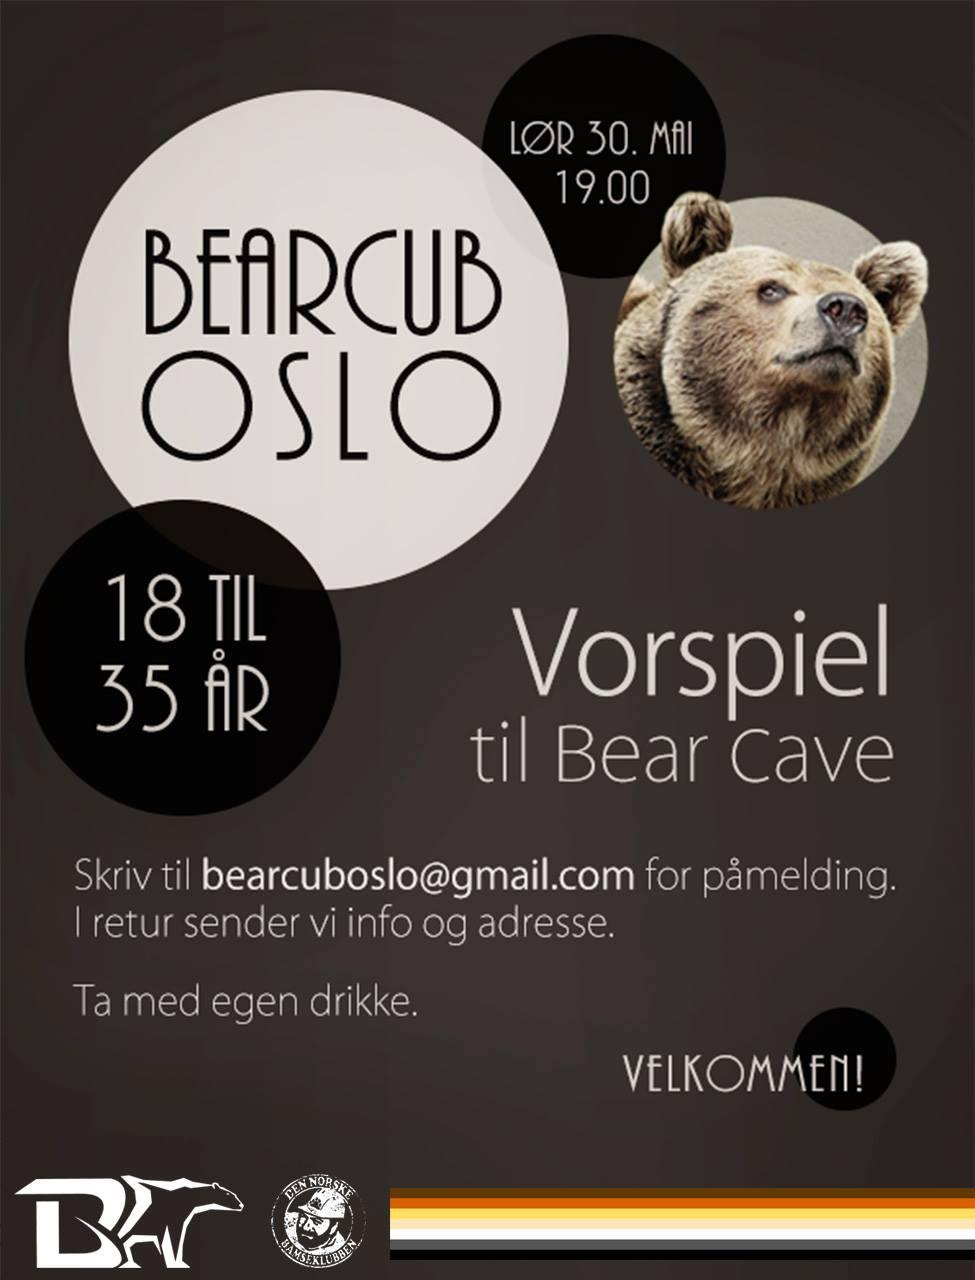 BearCub BearCave vorspiel